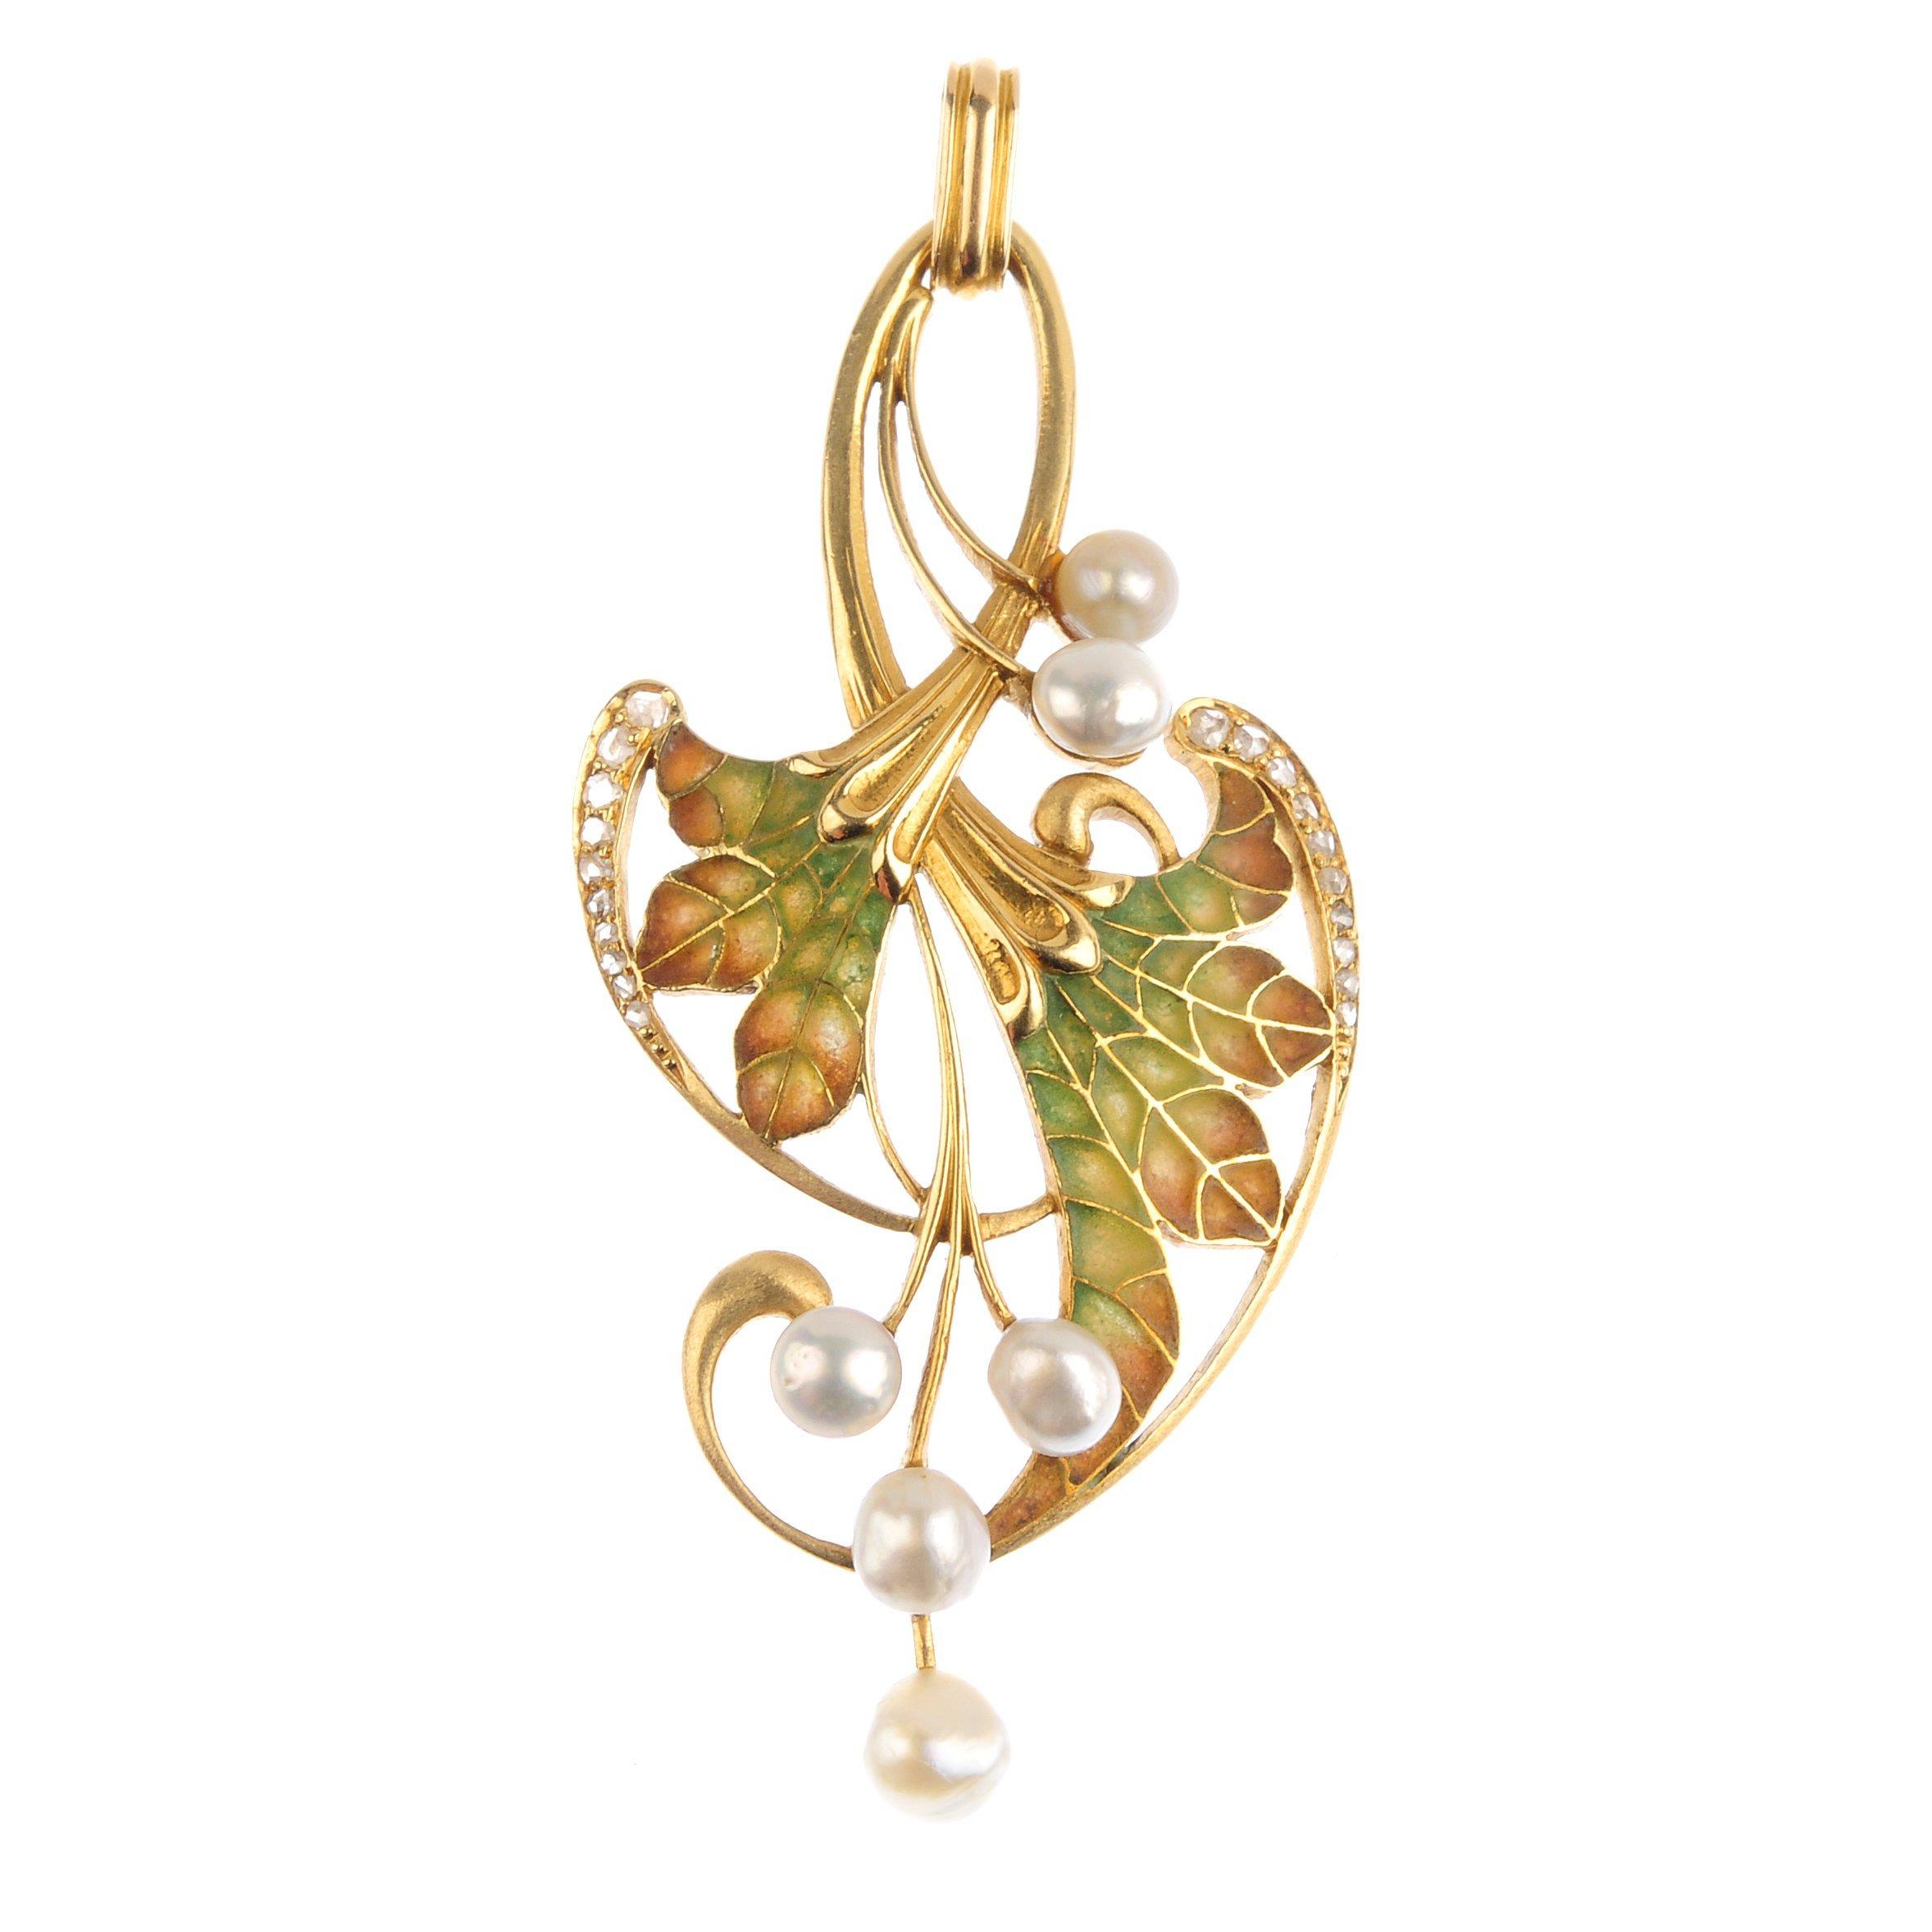 "<a href=""https://www.fellows.co.uk/2104-lot-59-An-Art-Nouveau-gold-plique-a-jour-enamel-pearl-and-diamond-pendant?utm_source=Ageless%20Heirlooms&utm_medium=blog&utm_campaign=Ageless%20Heirlooms%20Vintage&utm_content=Blog%20and%20social"">LOT 59</a>"